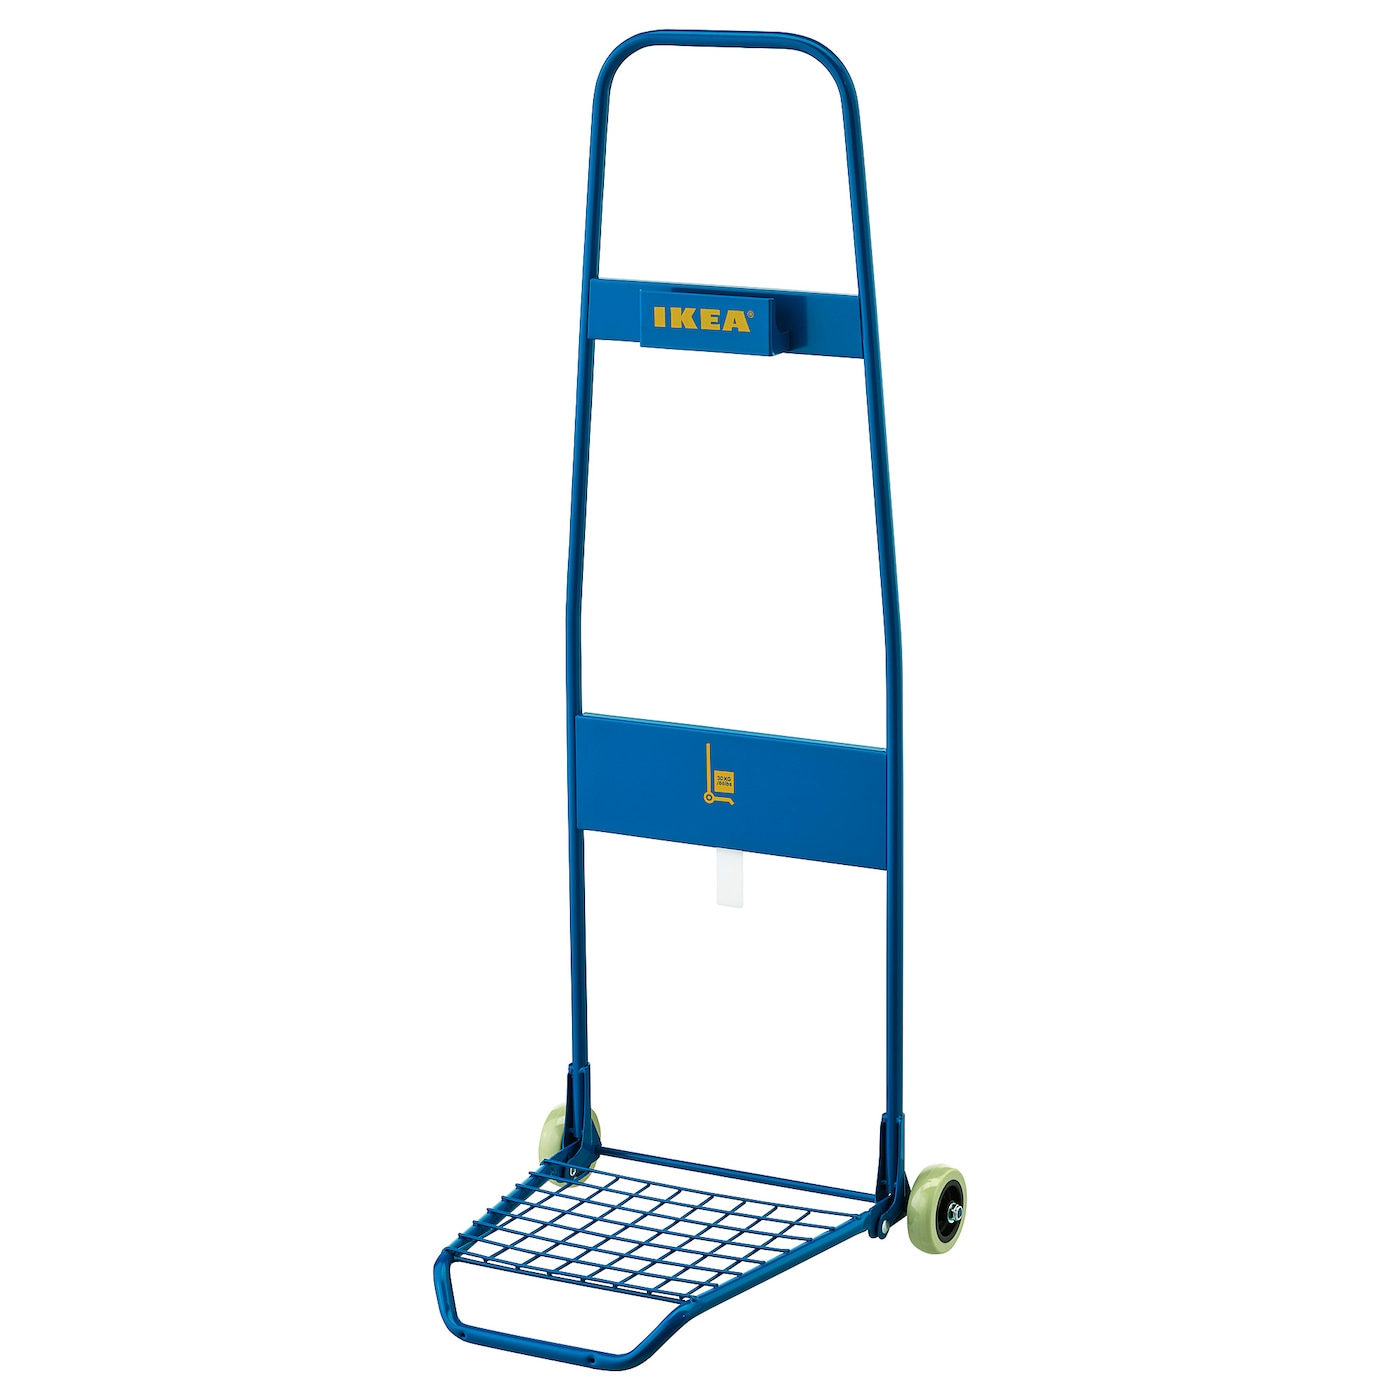 FRAKTA chariot bleu 38 cm 38 cm 105 cm 30 kg